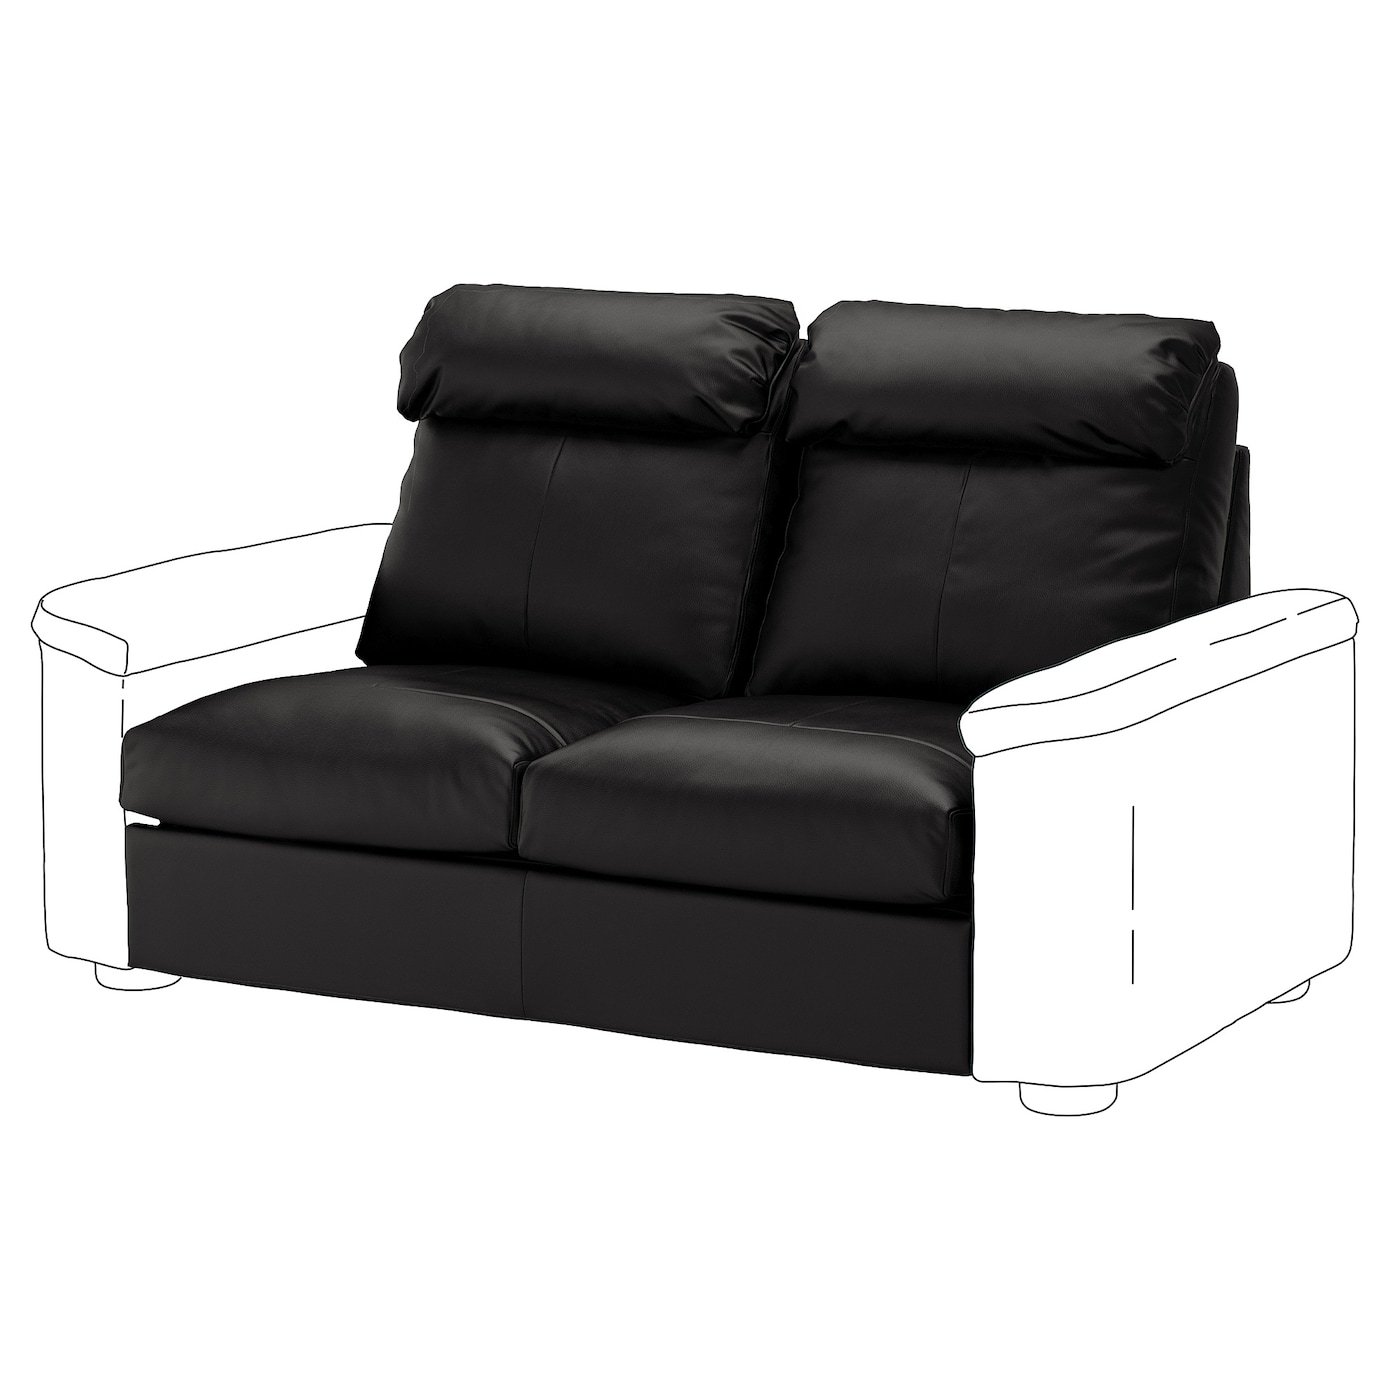 IKEA LIDHULT Sekcja 2-os sofa rozkładana, Grann/Bomstad czarny